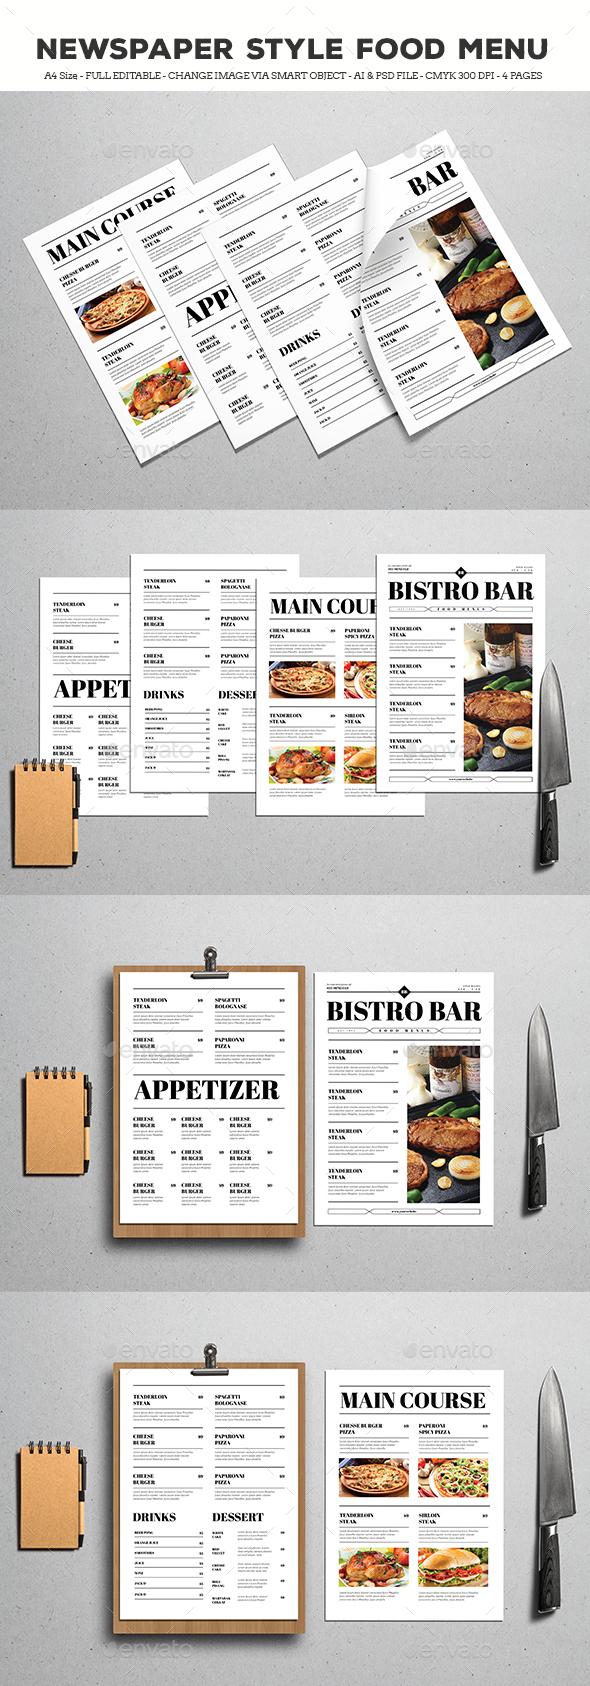 Newspaper Style Food Menus - Food Menus Print Templates